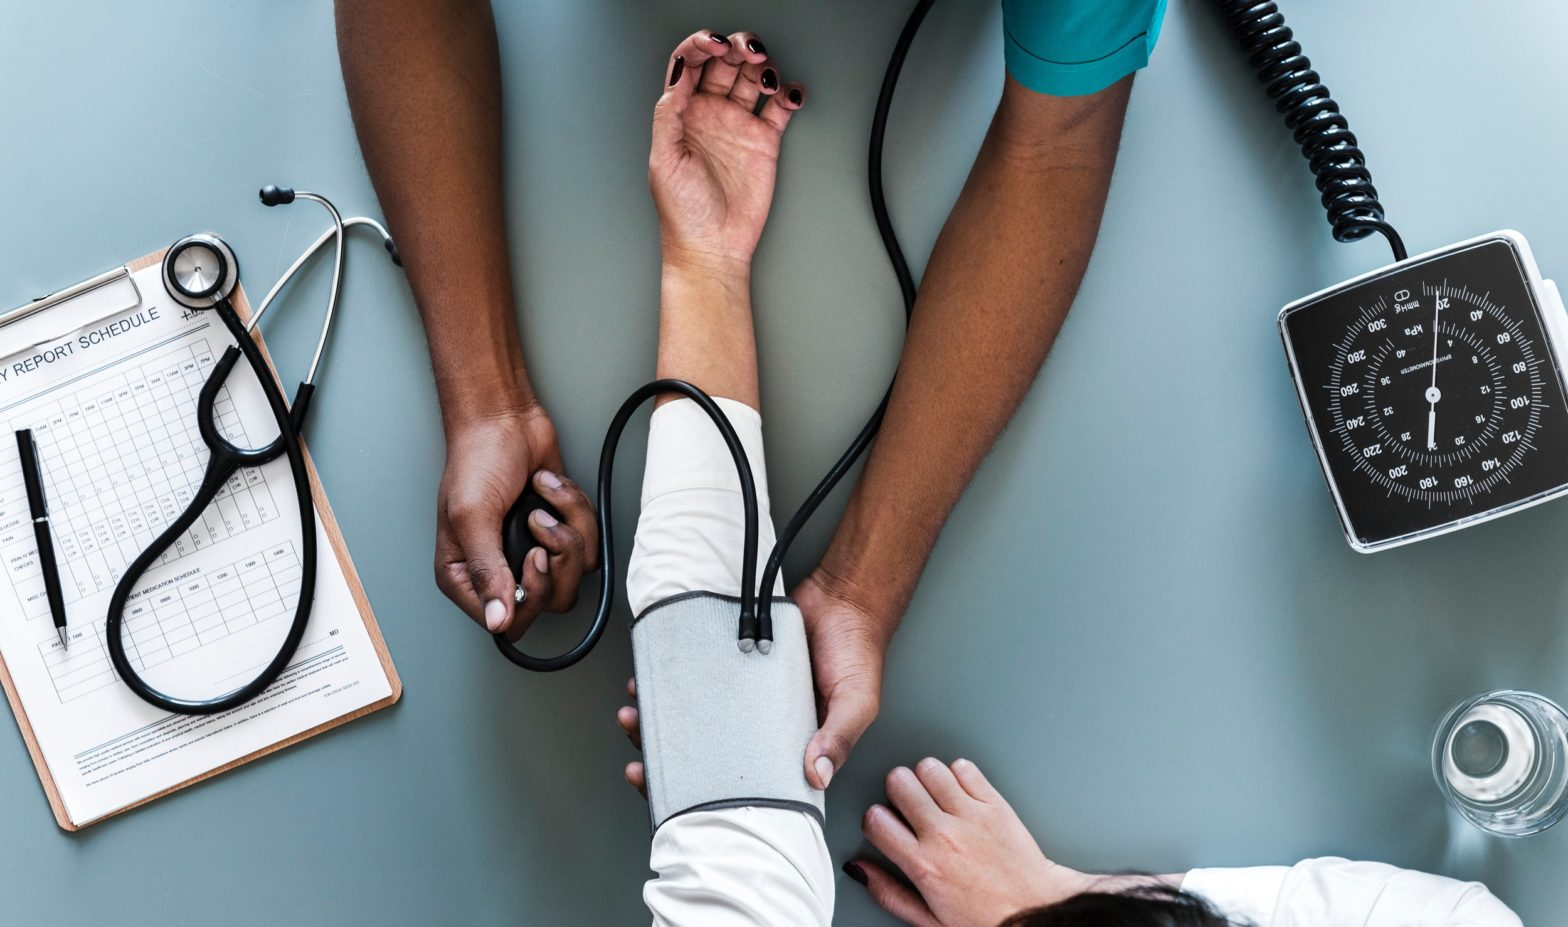 A nurse checking blood pressure.